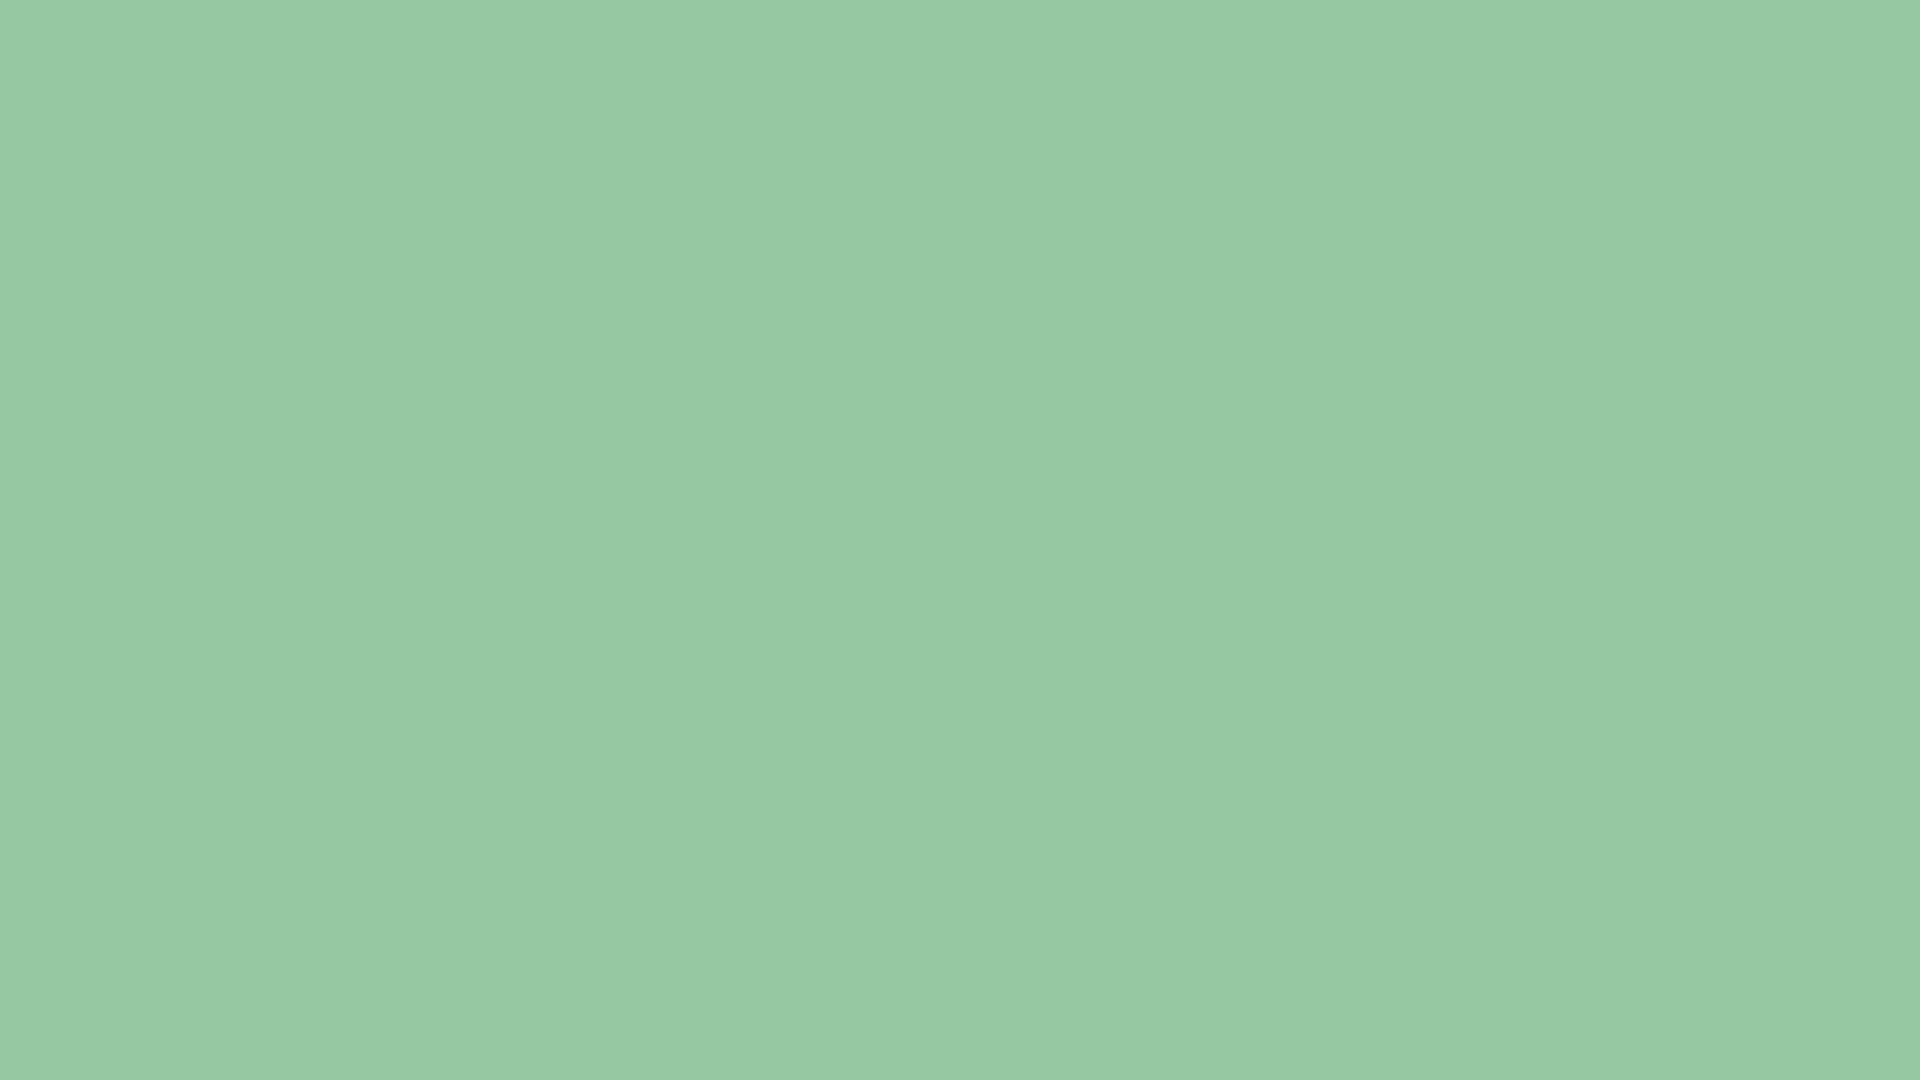 1920x1080 Eton Blue Solid Color Background